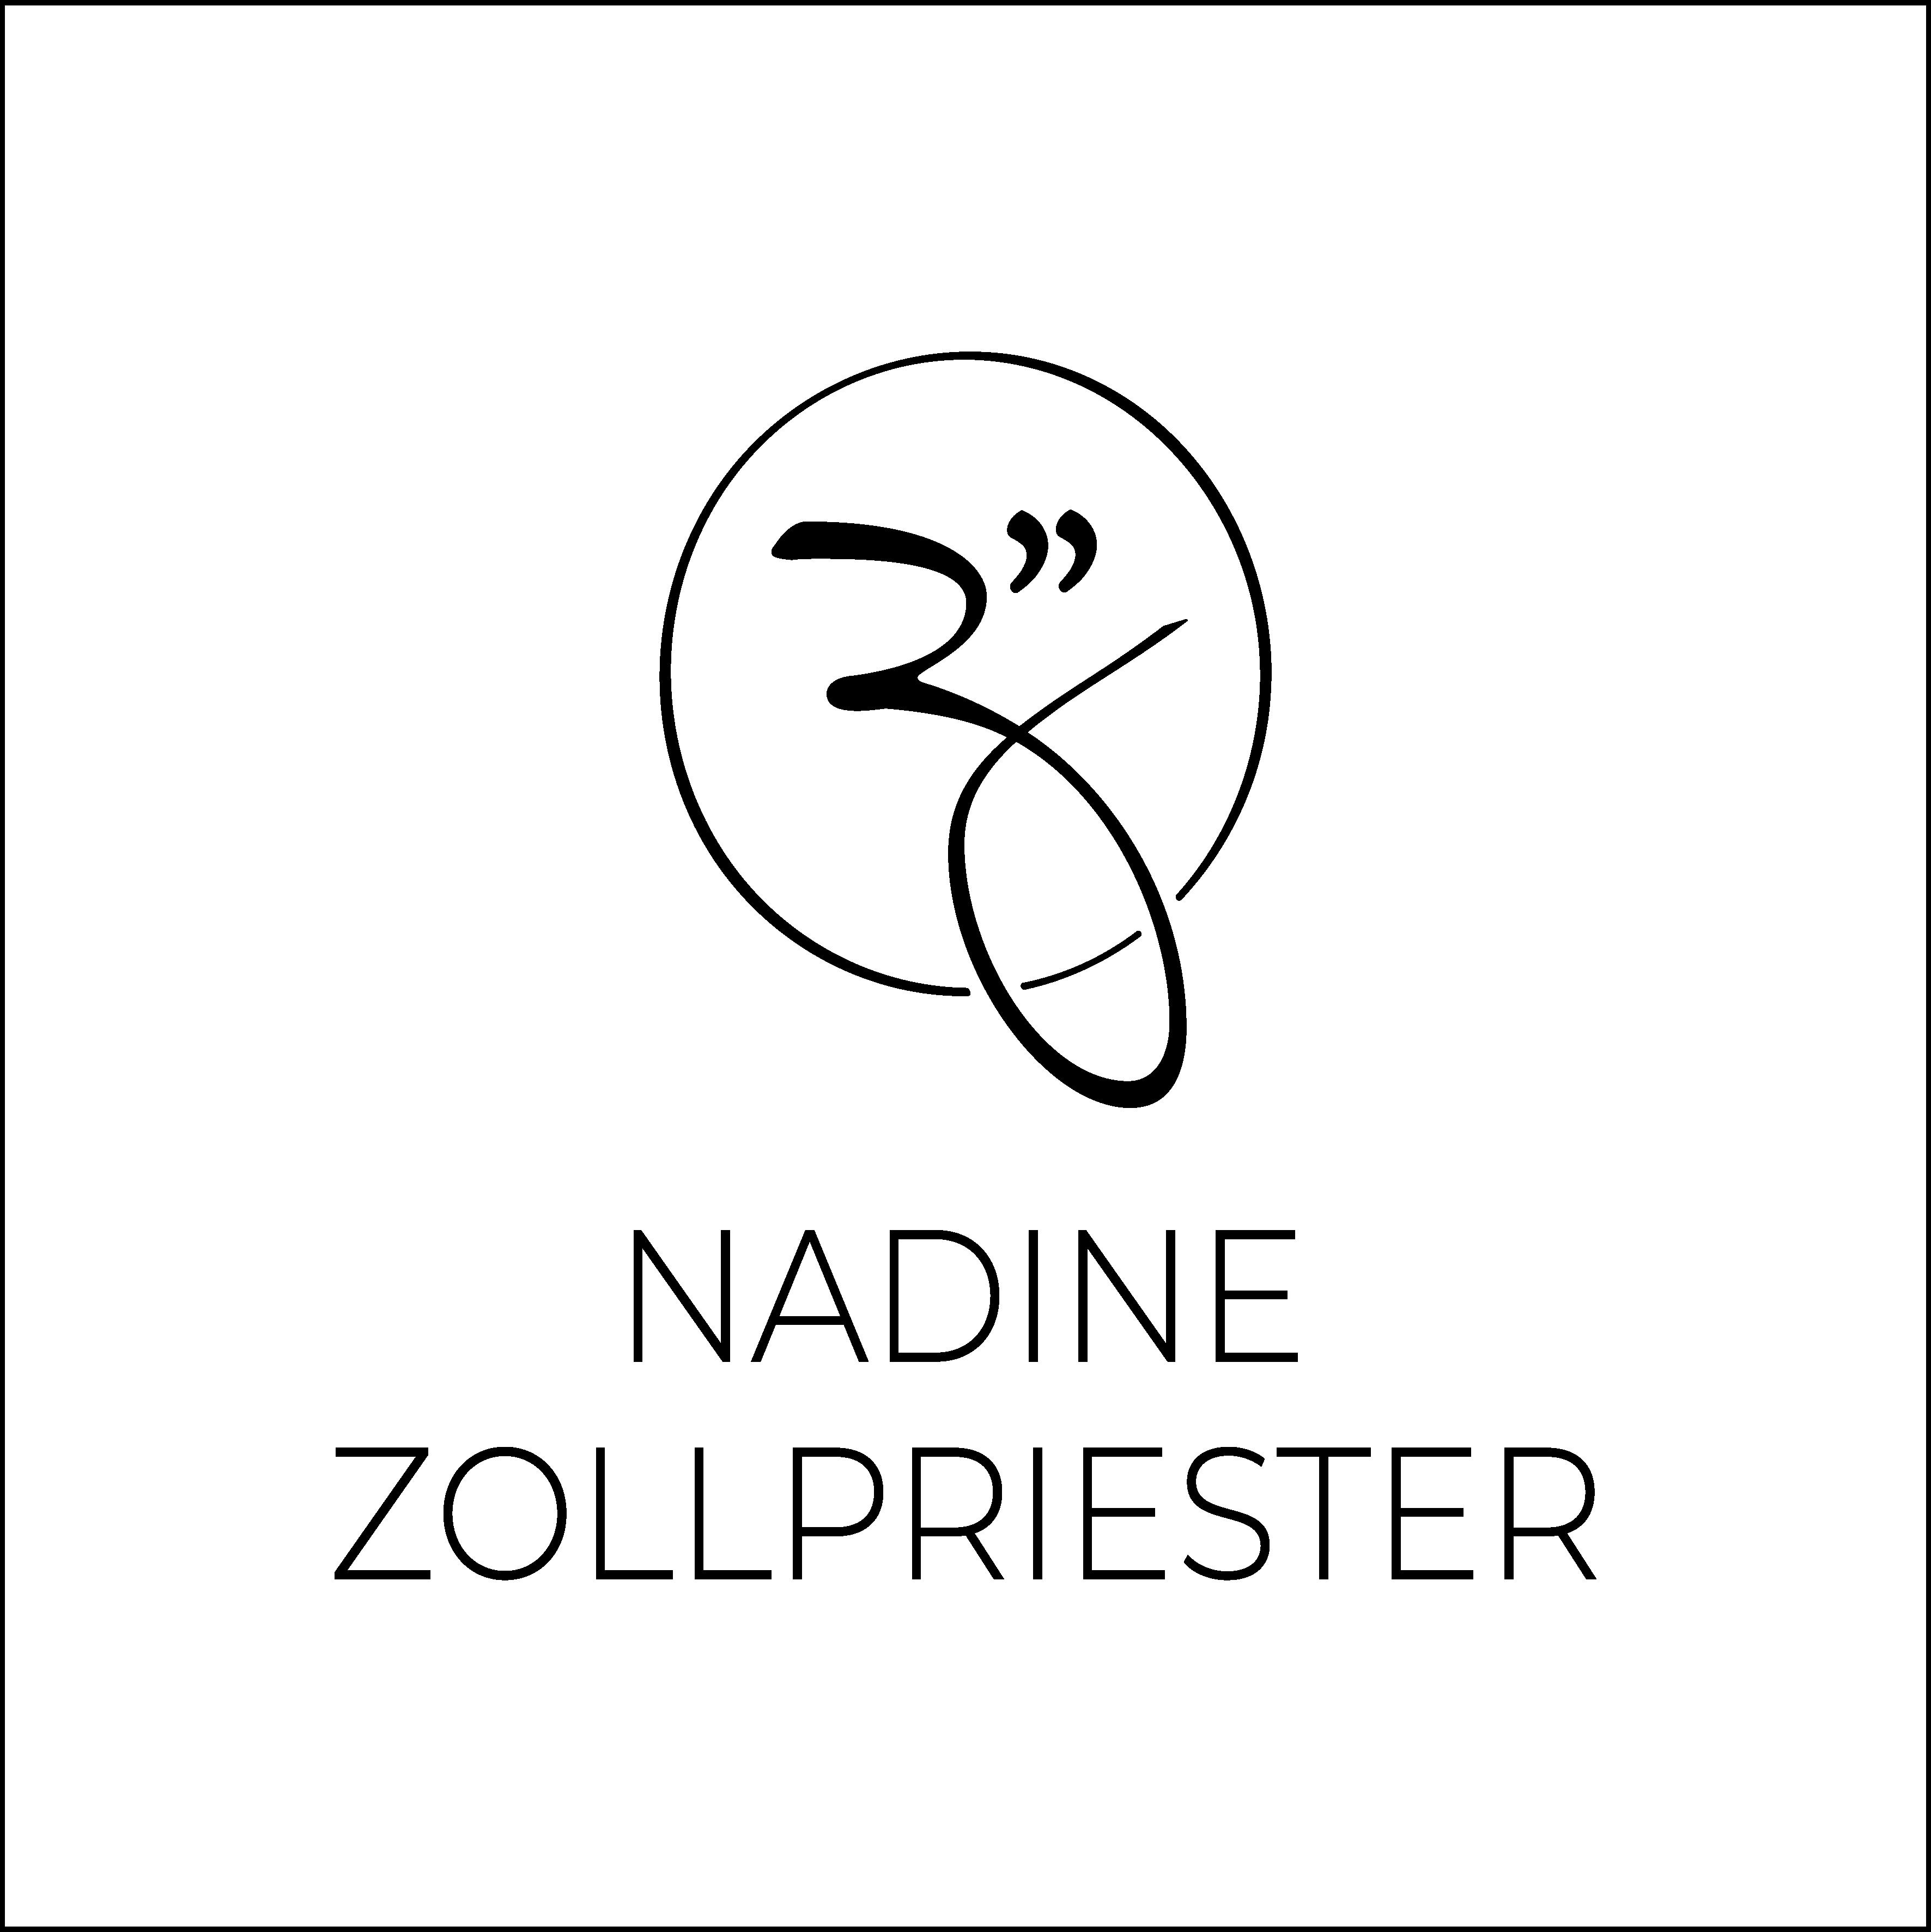 nadine zollpriester coaching marketing logo atelyay